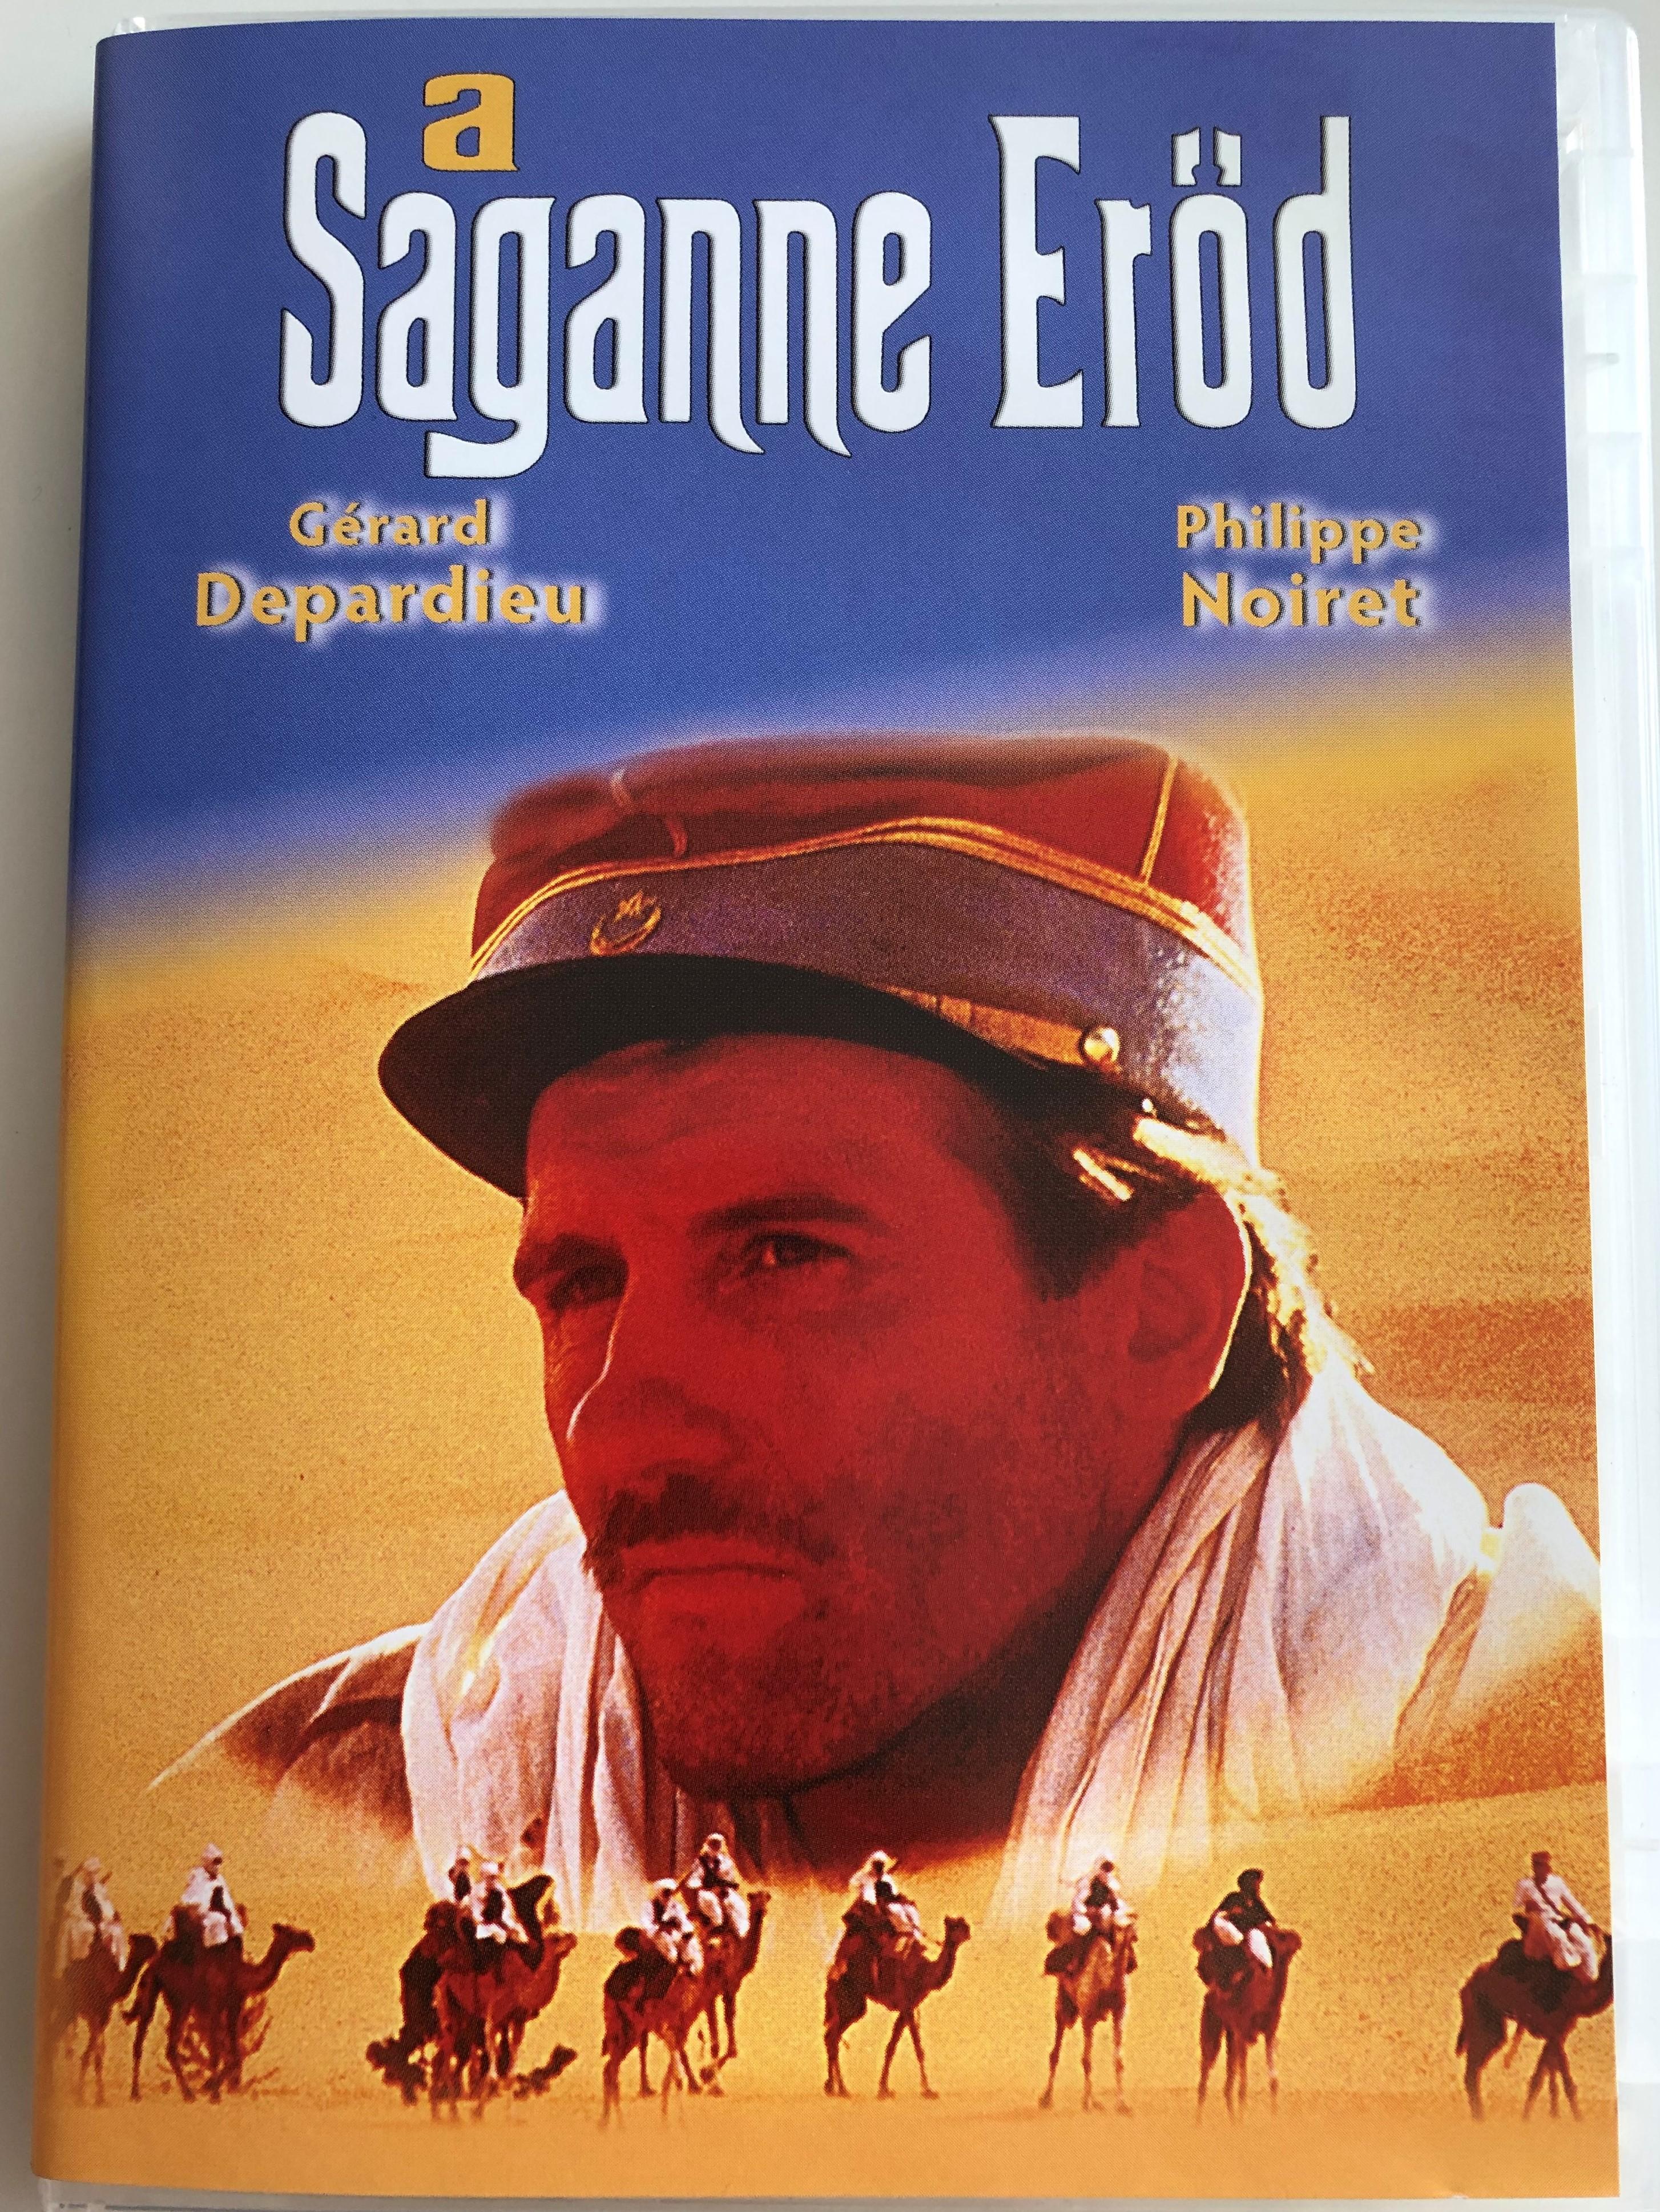 fort-saganne-dvd-1984-a-saganne-er-d-directed-by-alain-corneau-1.jpg